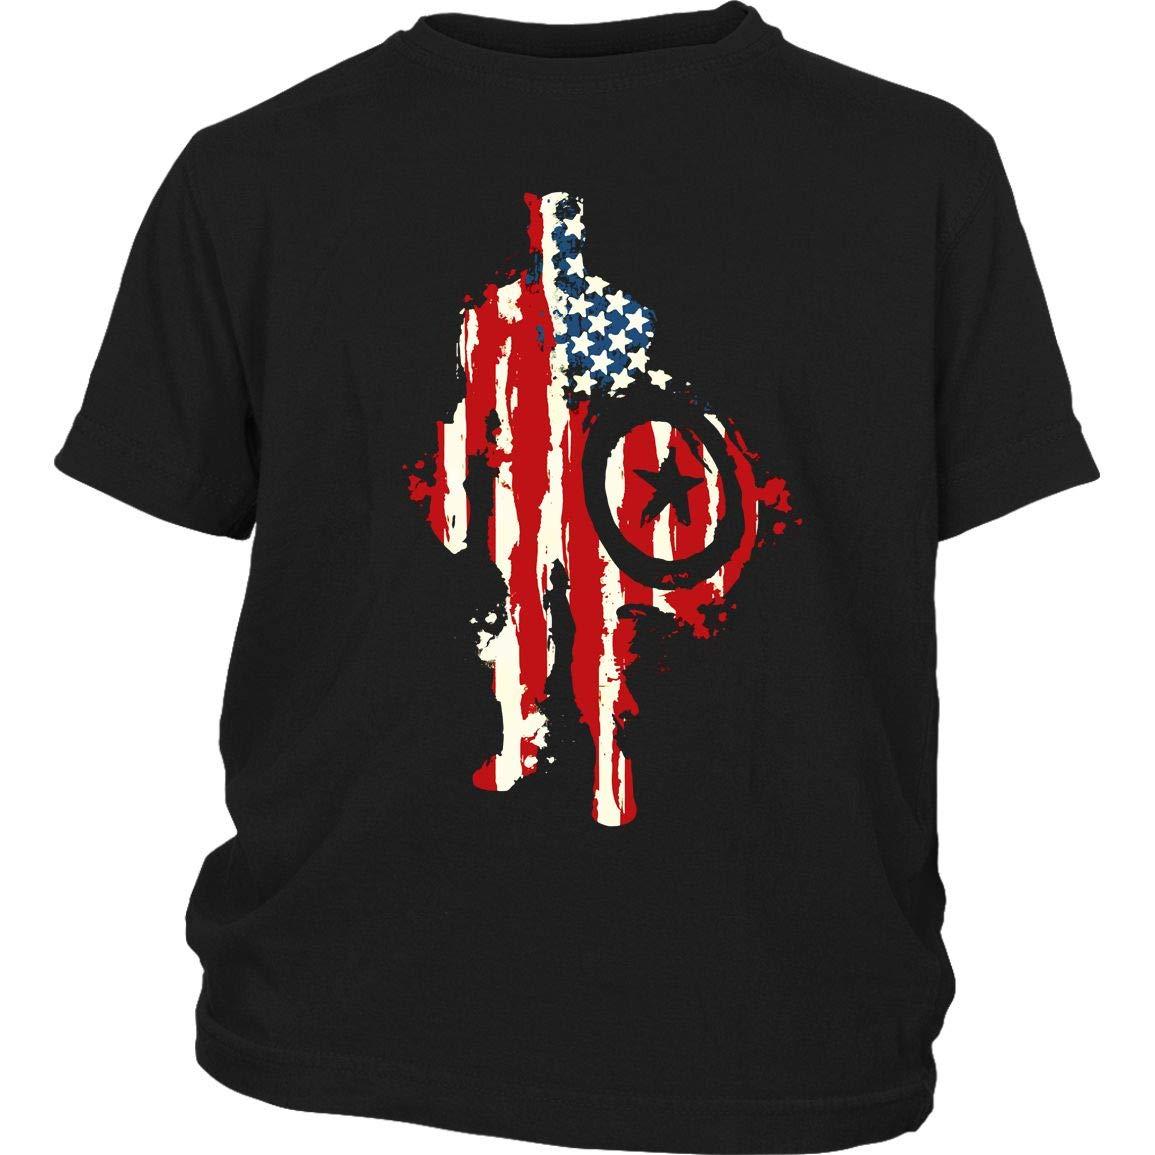 Flag T Shirt Cool Movie T Shirt Heroes T Shirt 1767